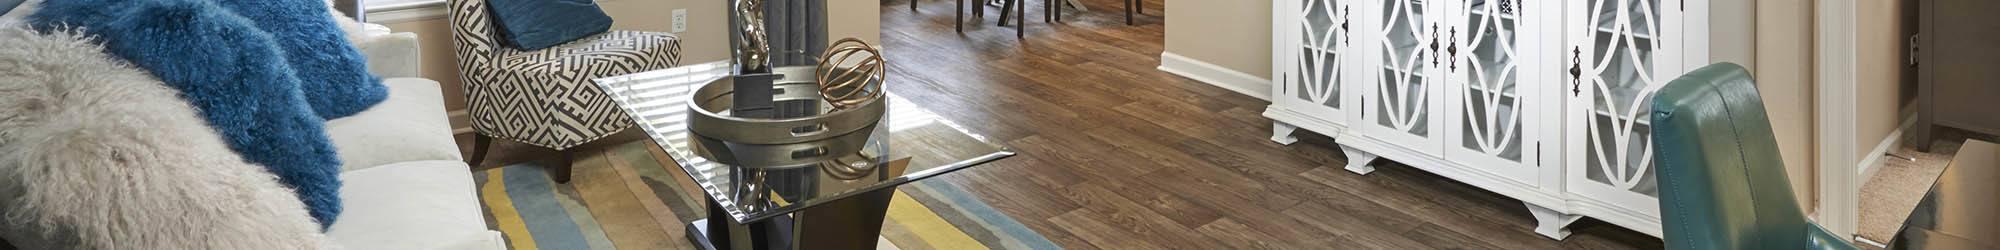 Floor Plans at Skyecrest Apartments